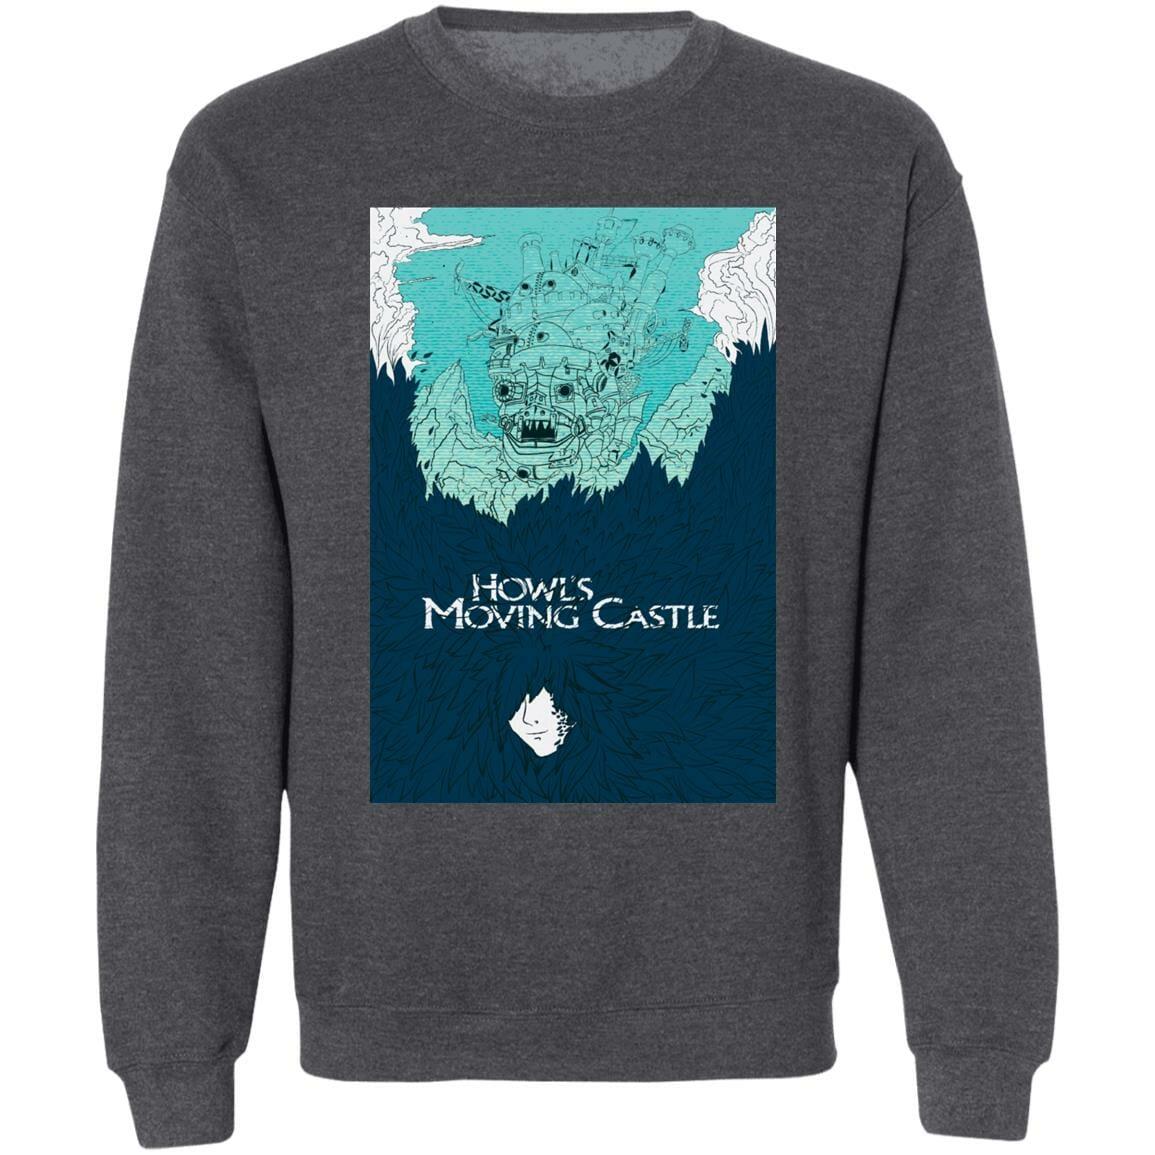 Howl's Moving Castle Blue Tone Art Sweatshirt